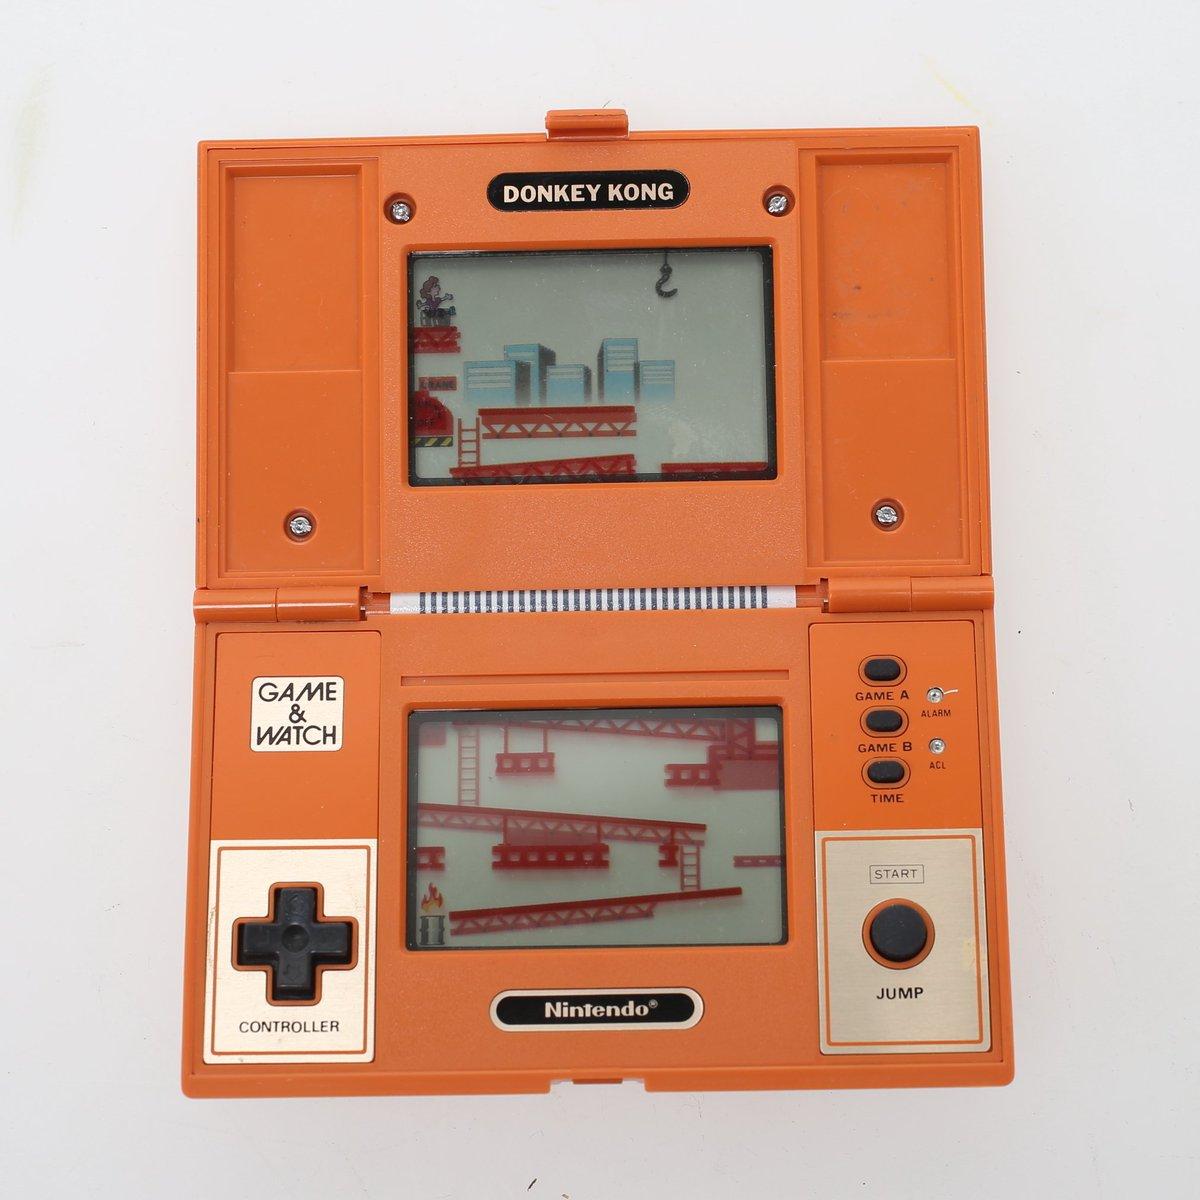 Retweet and let @NintendoUK @NintendoAmerica @Nintendo that you want Game & Watch re-released. #Nintendopic.twitter.com/MZg2uBbBjg